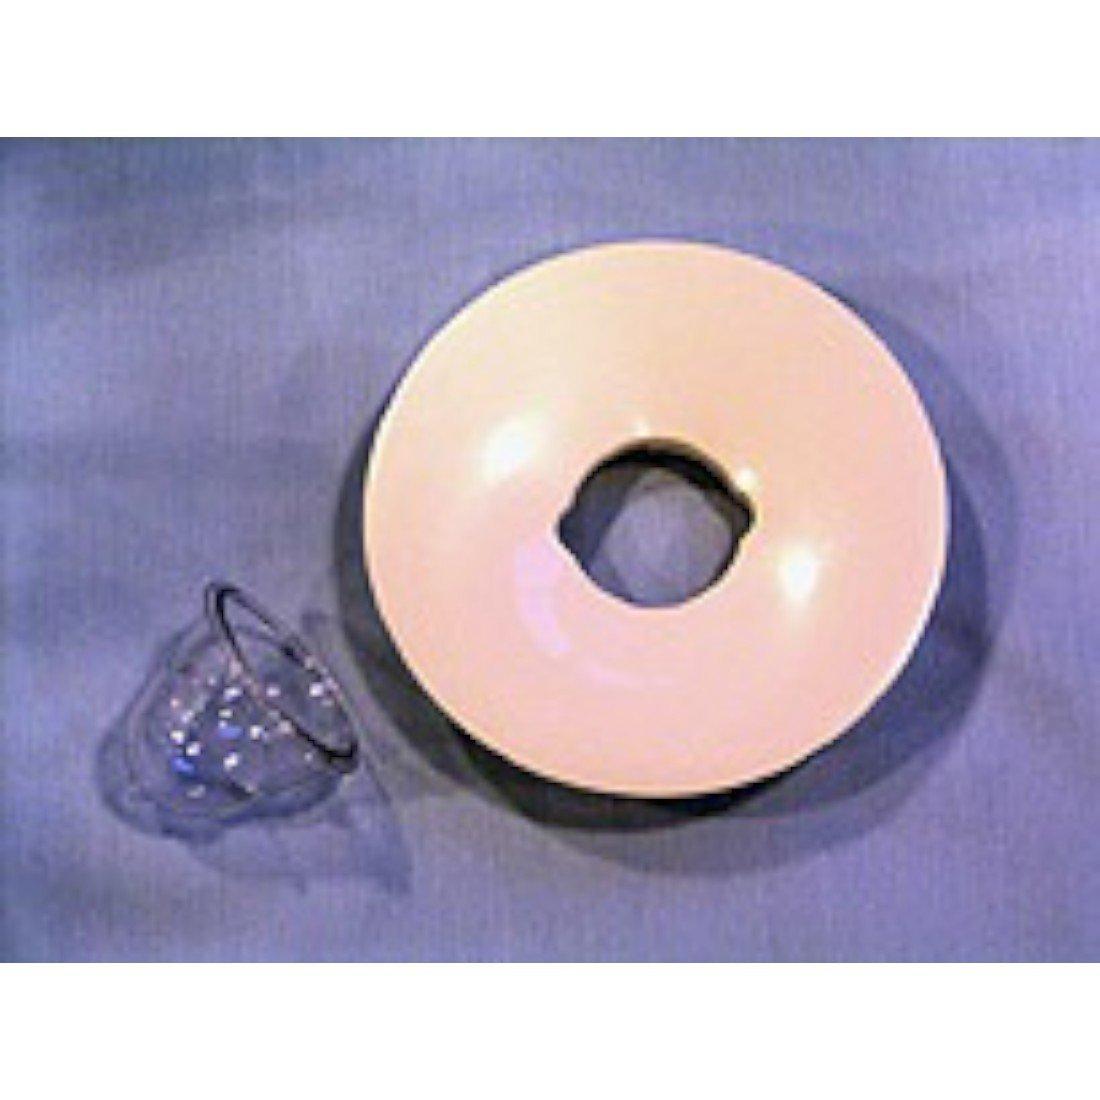 KENWOOD Replacement liquidiser lid & filler cap - For: FP510, FP520, FP720 Etc. (681191) VDTAZ012A